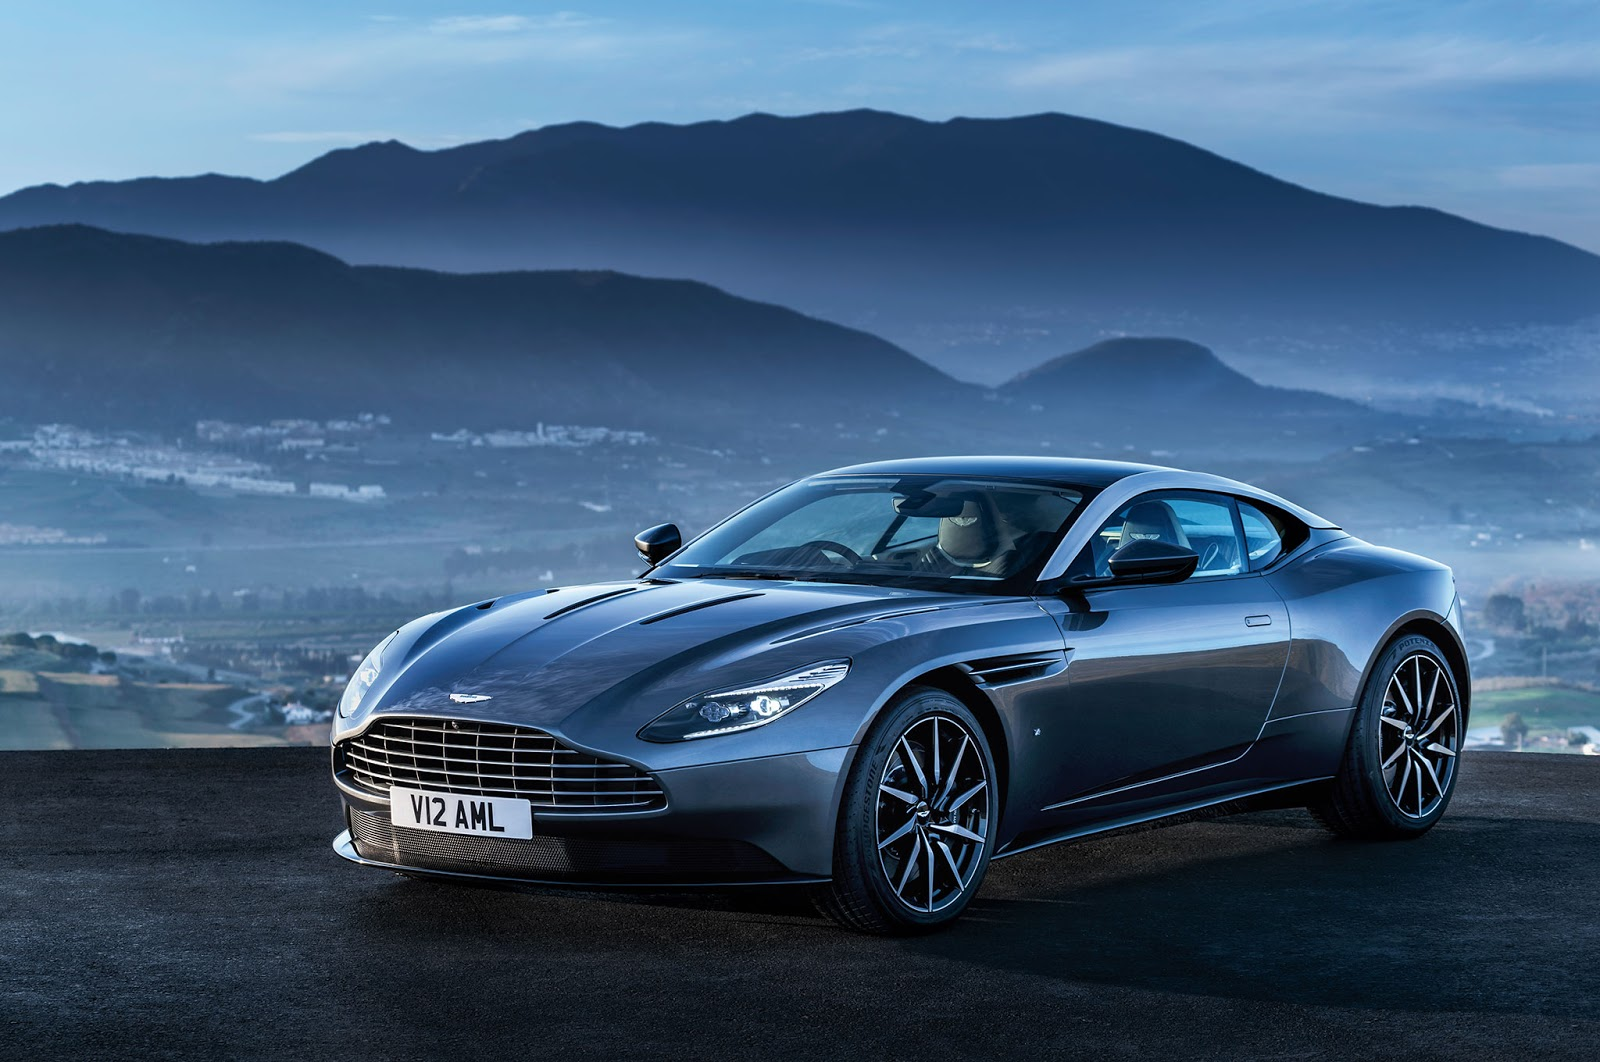 DB11 Aston Martin the Blue